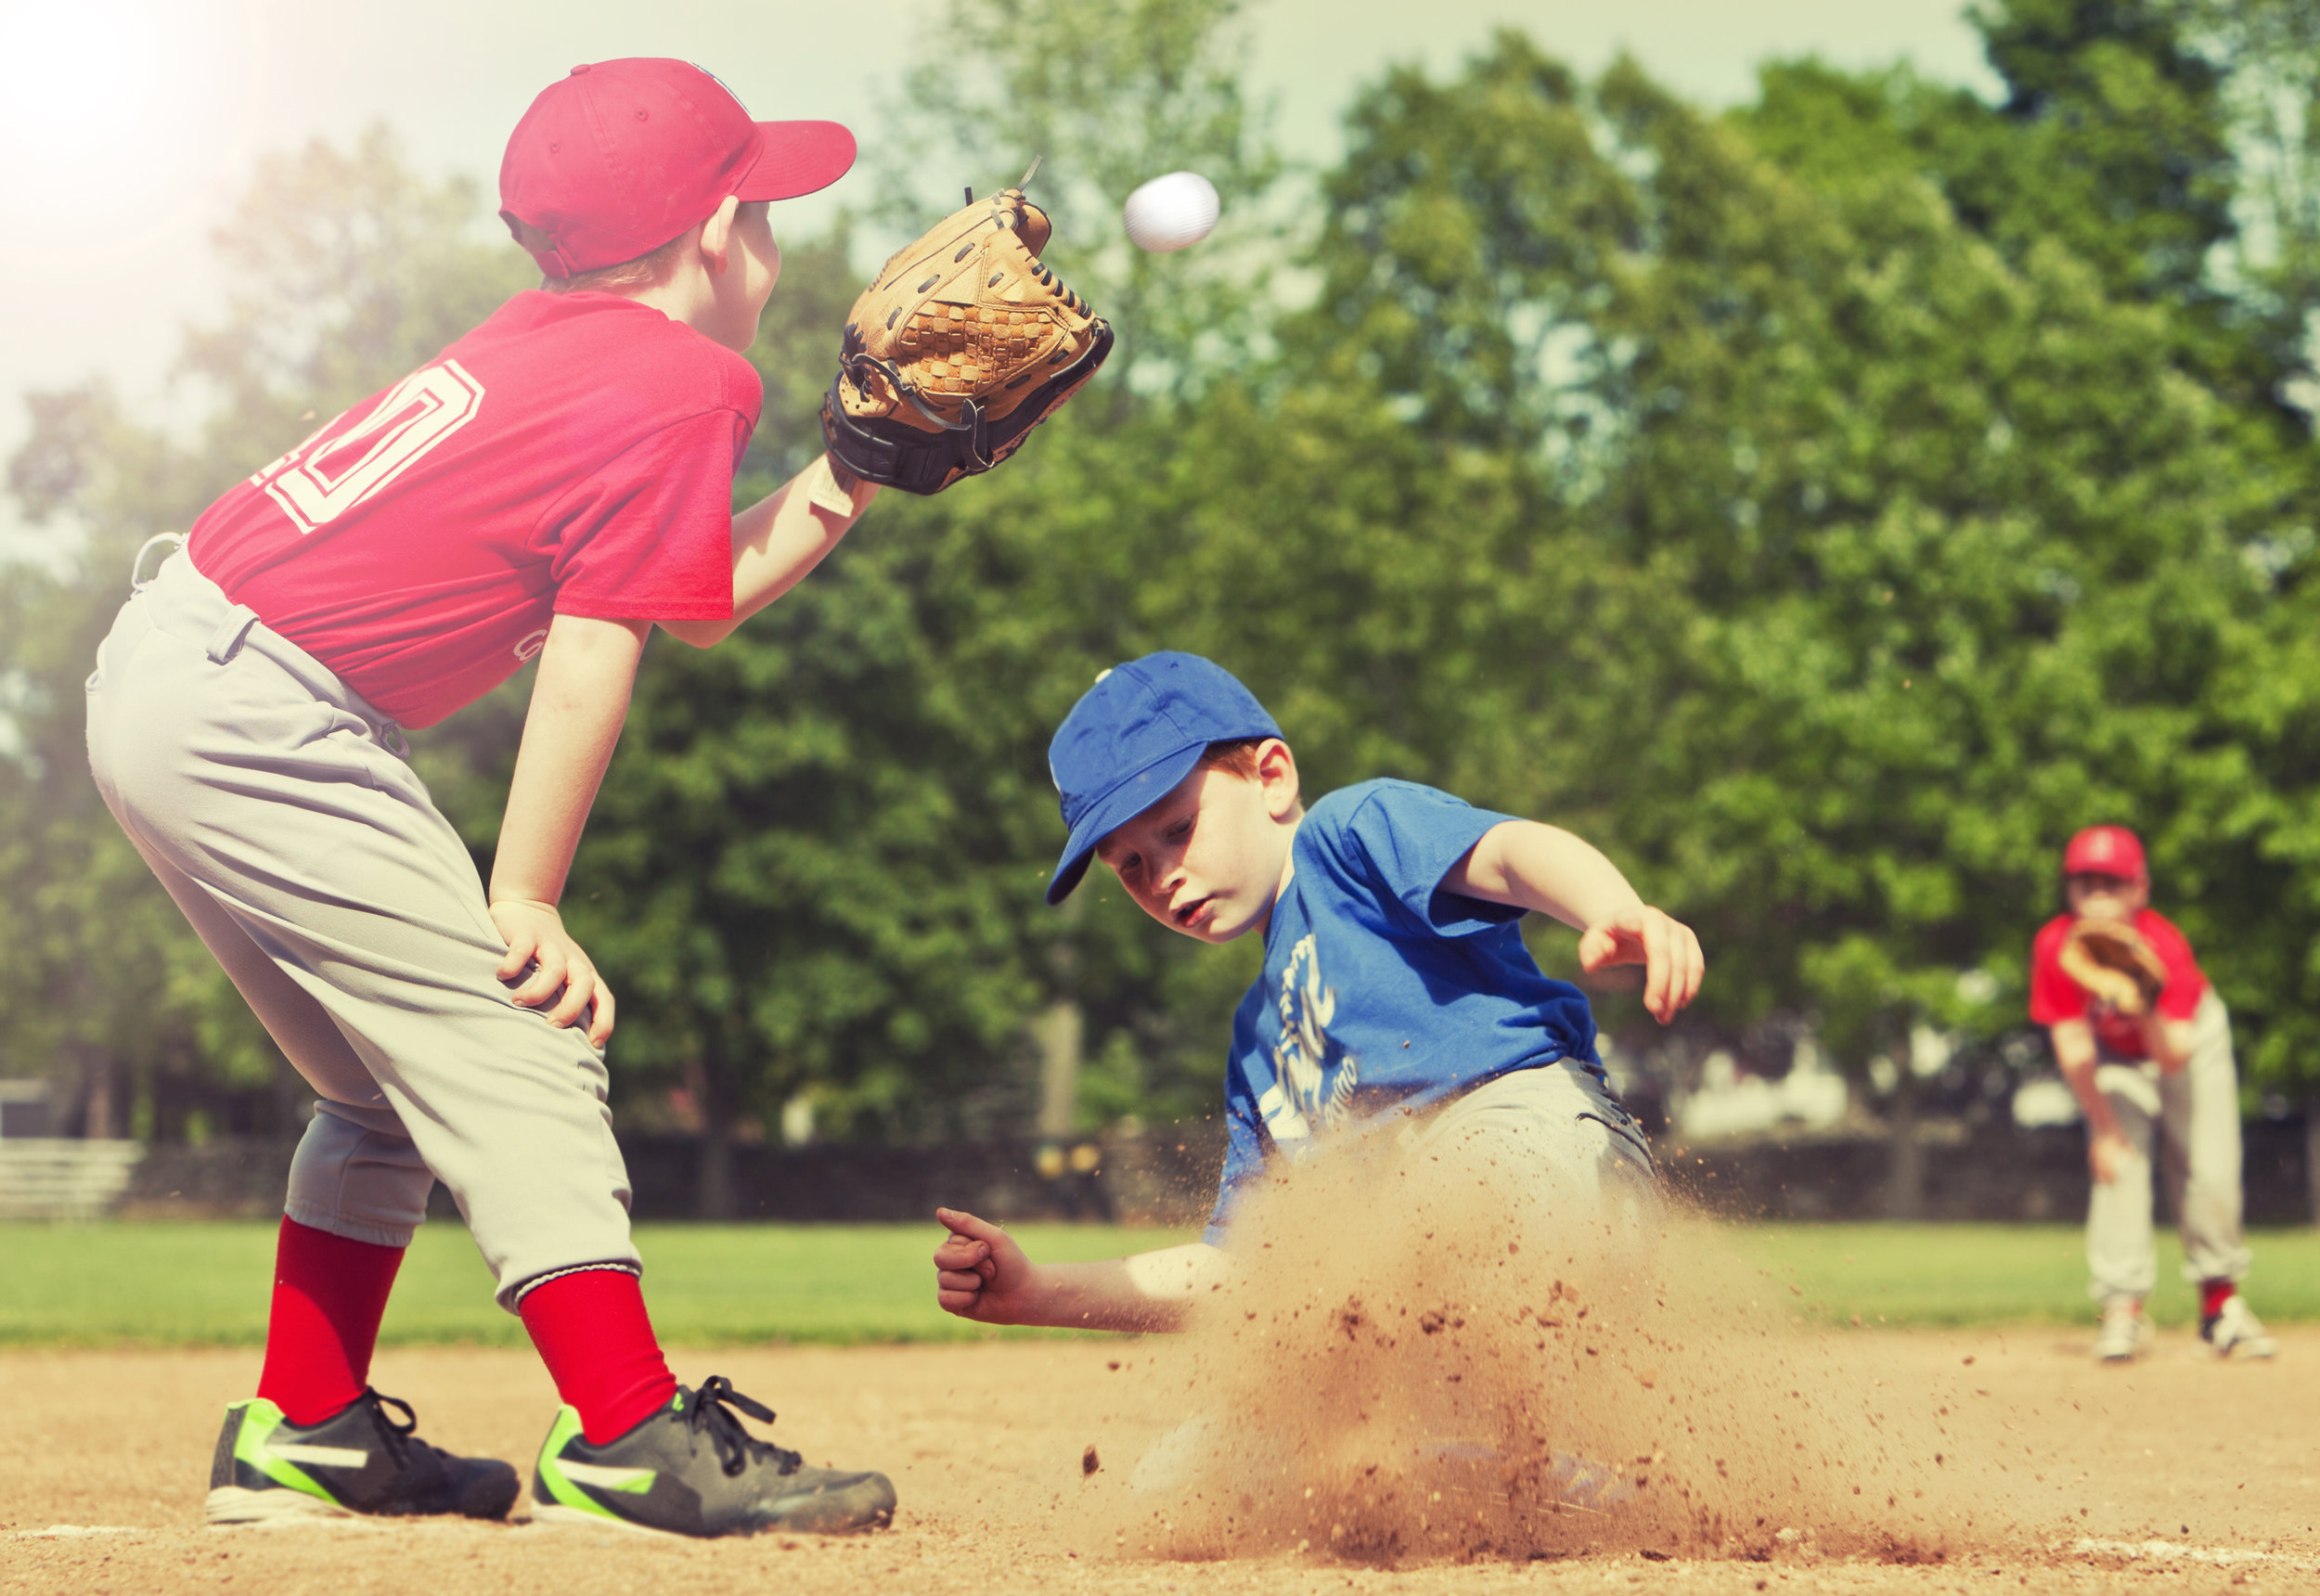 12U Baseball Development Clinic - WHEN: August 14th, 2019 | 9am - 4pmWHERE: Russell E. Diethrick Park, Jamestown, NY.